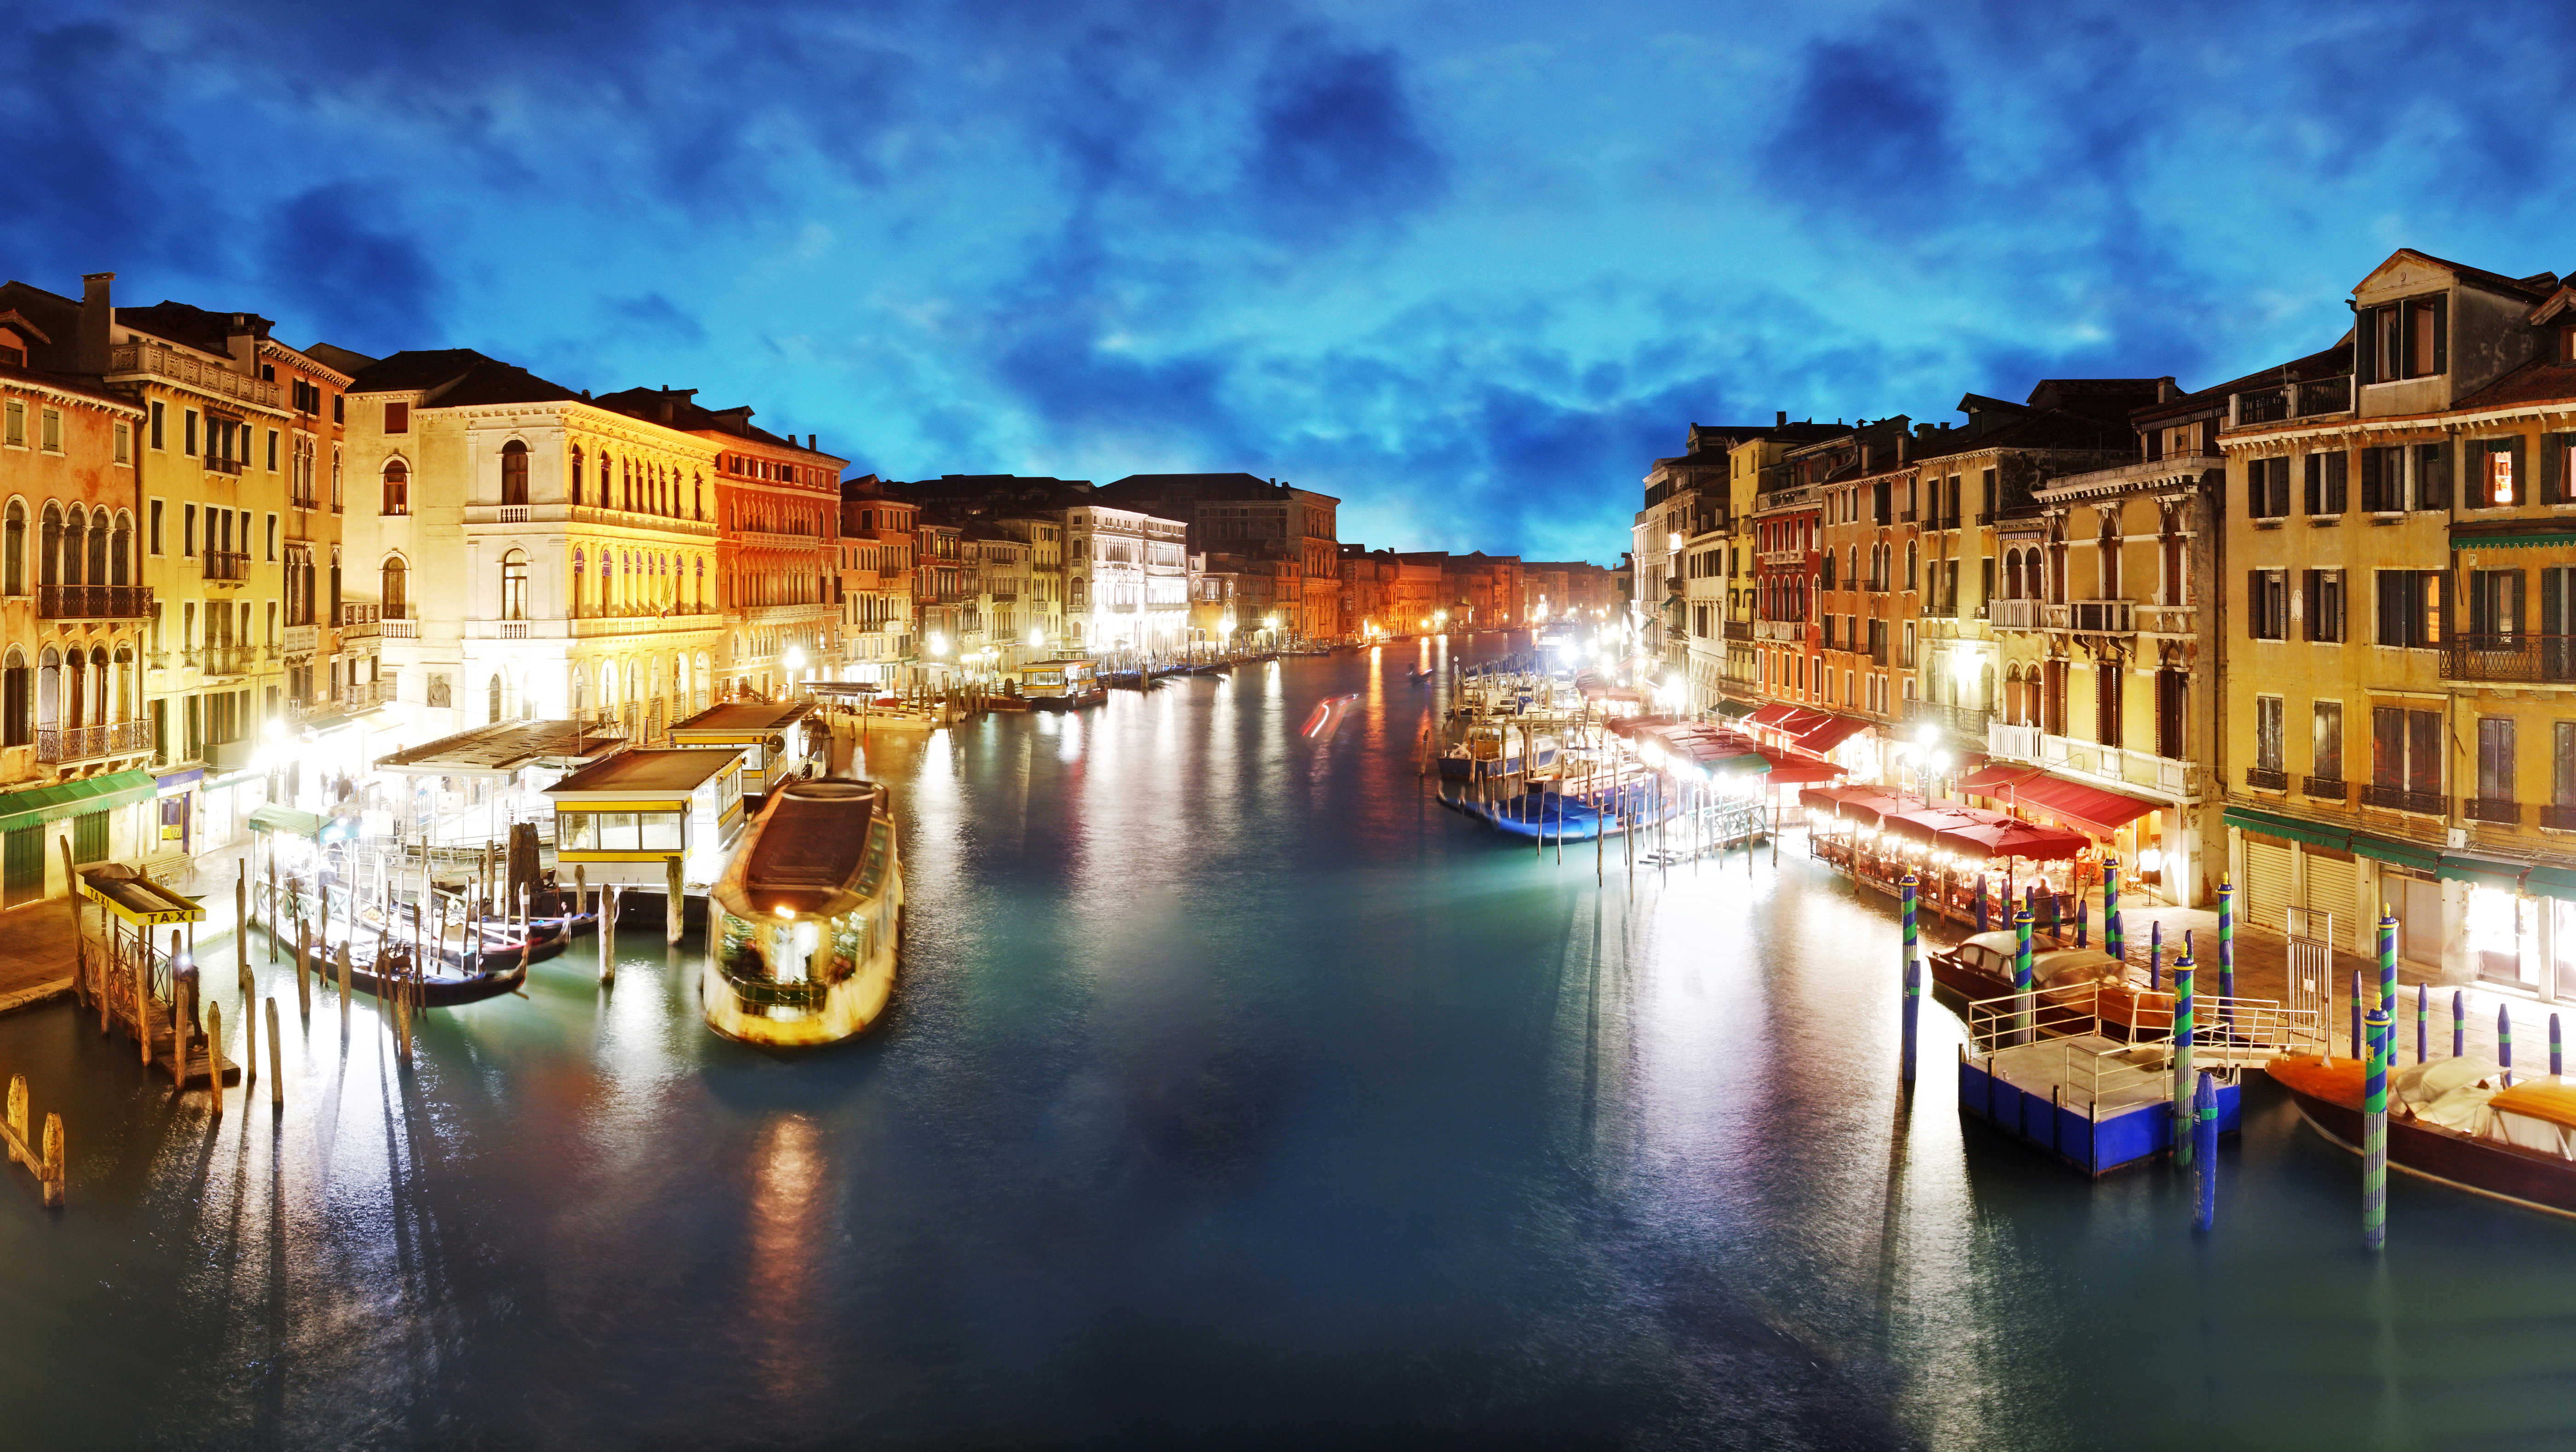 Sunset Over Grand Canal, Venice, Italy  № 1471235  скачать